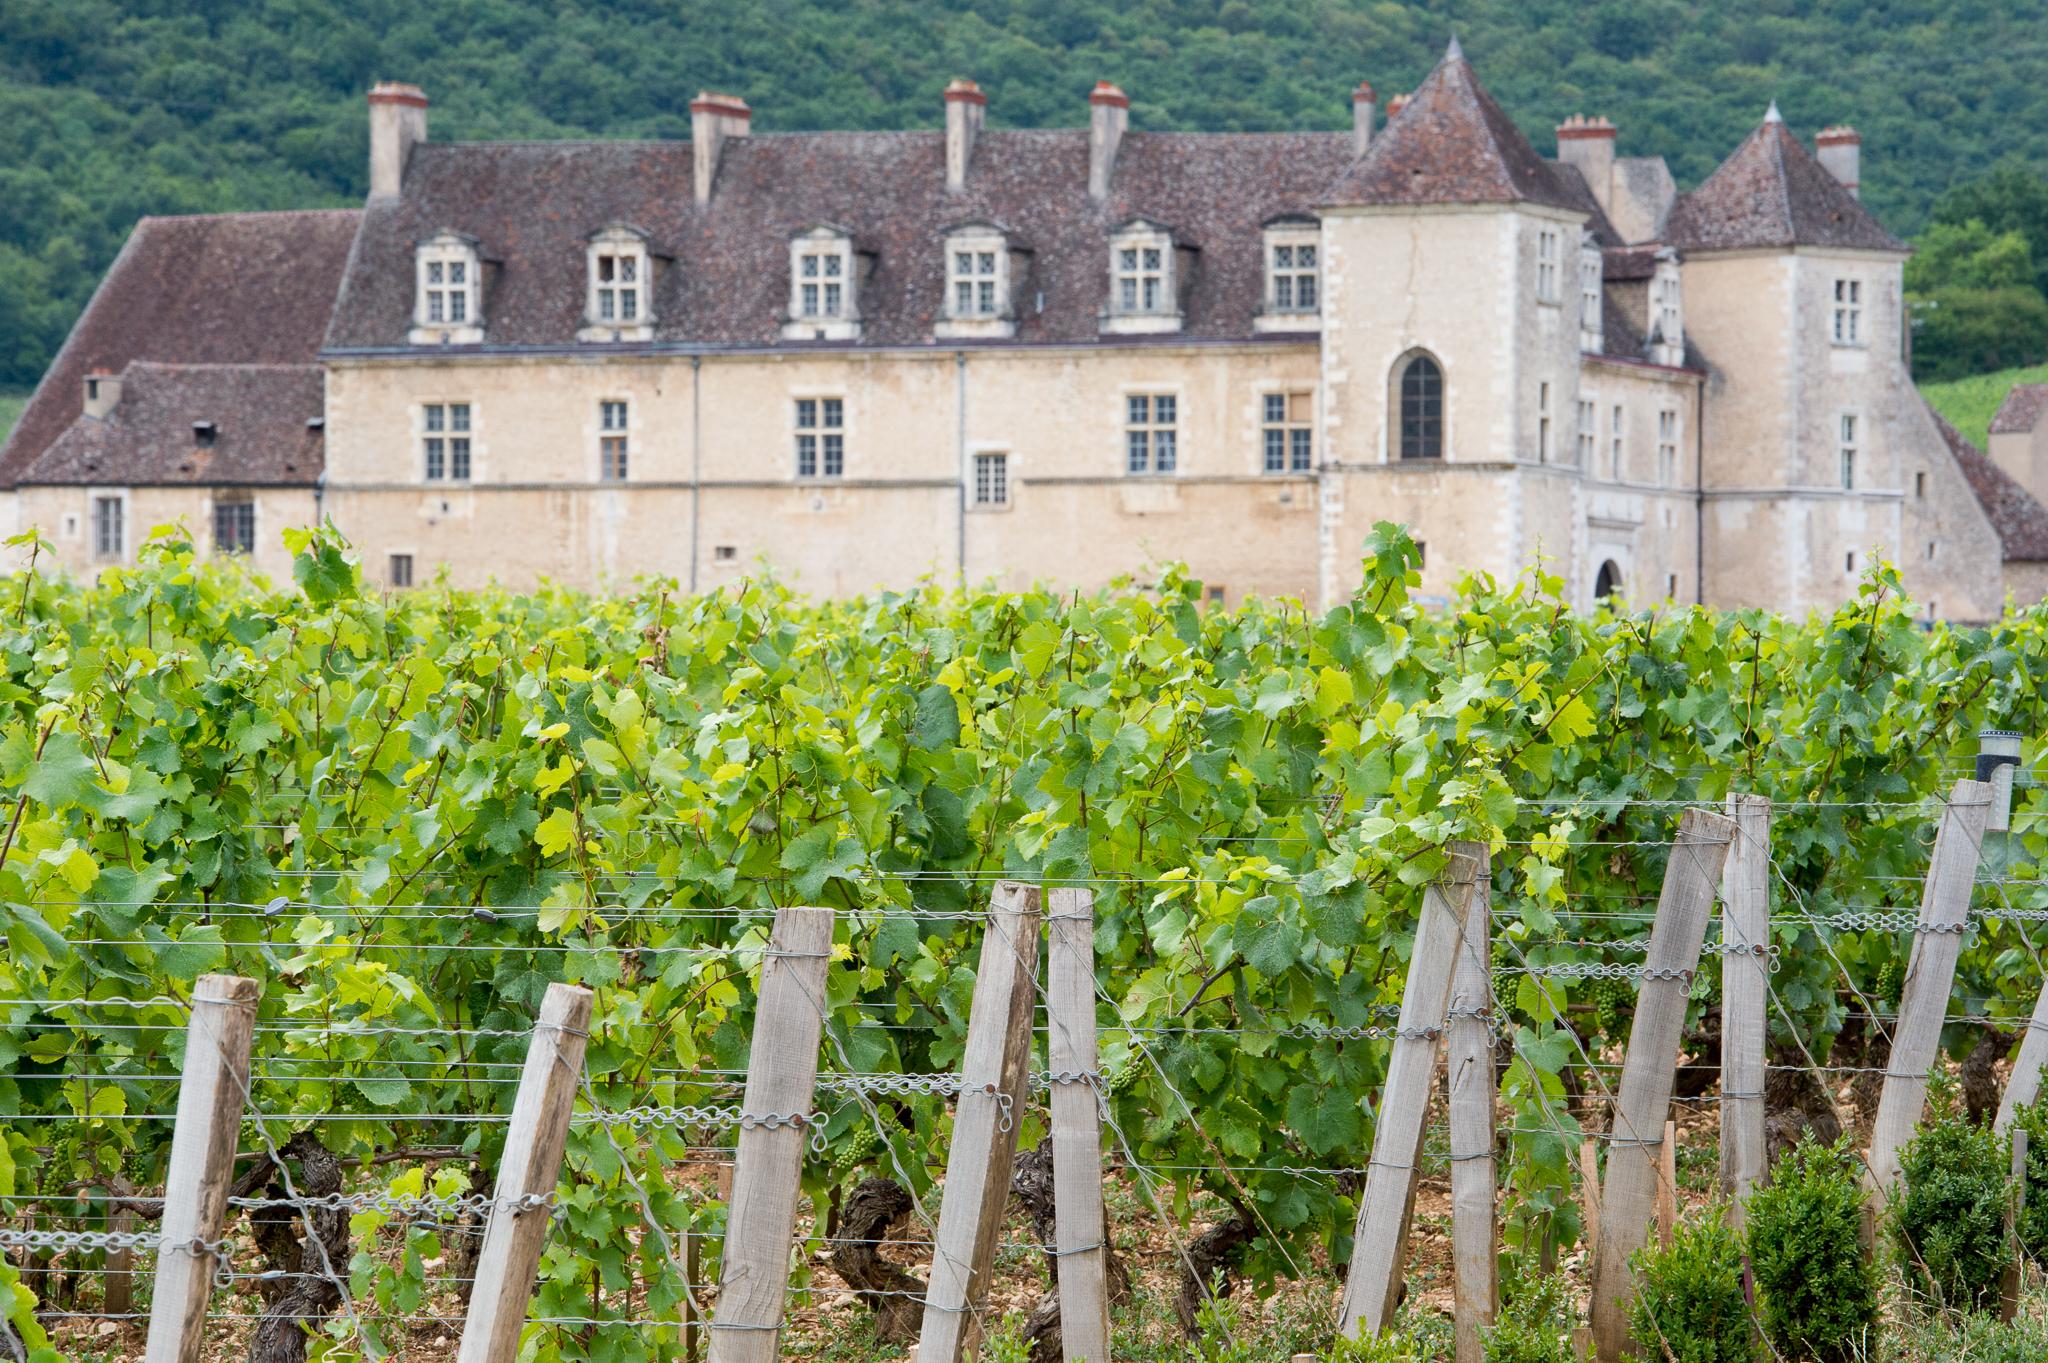 Jason-Davis-Images-Burgundy-0012.jpg